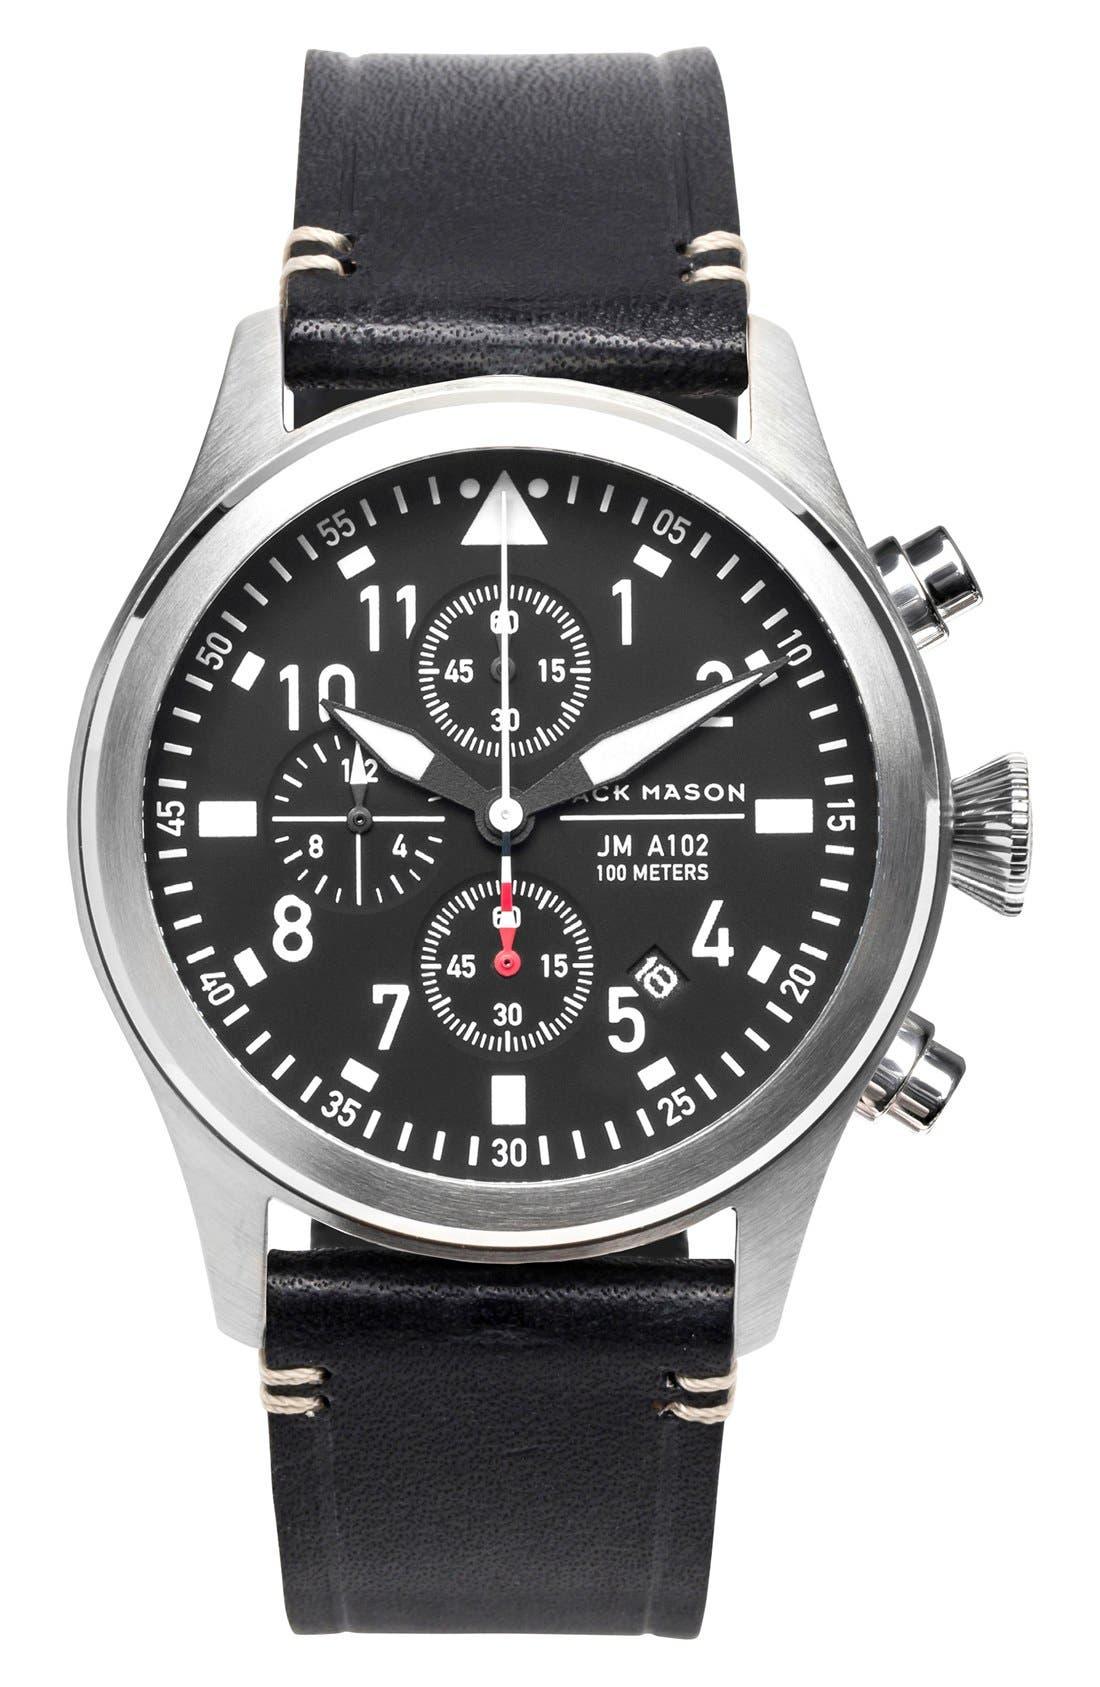 Main Image - Jack Mason Chronograph Leather Strap Watch, 42mm